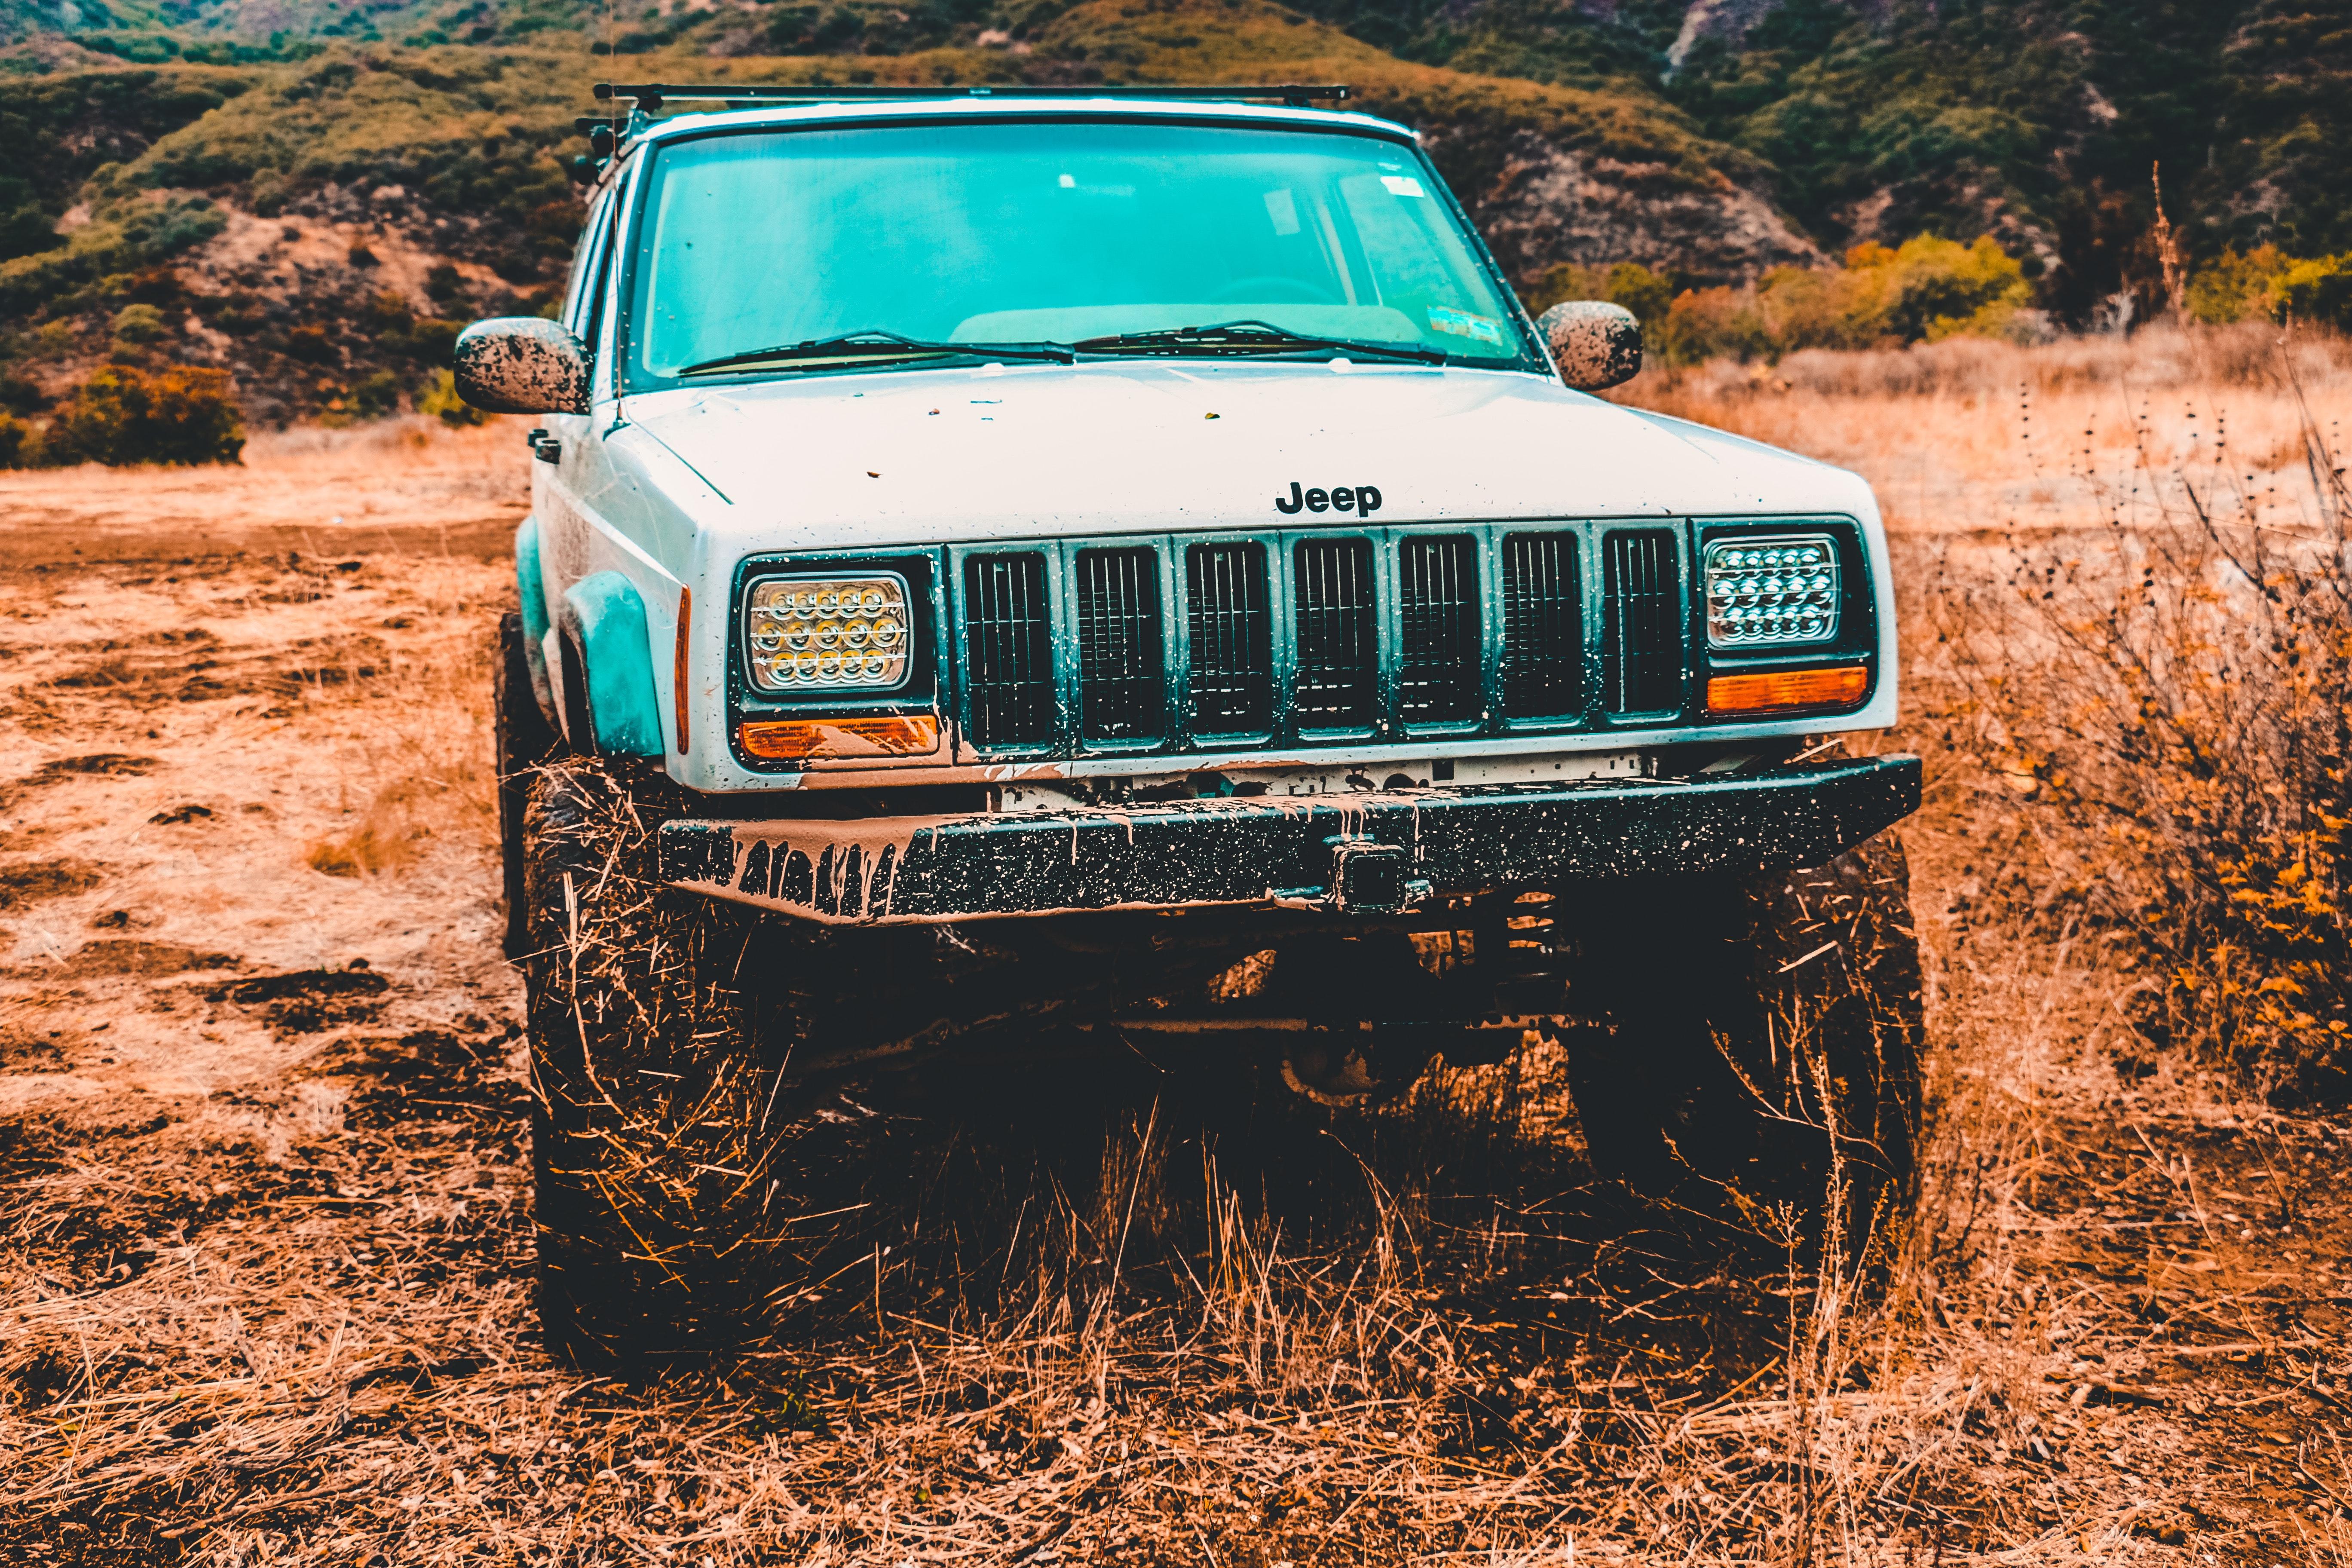 Gray Jeep Suv, Adventure, Landscape, Trees, Transportation system, HQ Photo